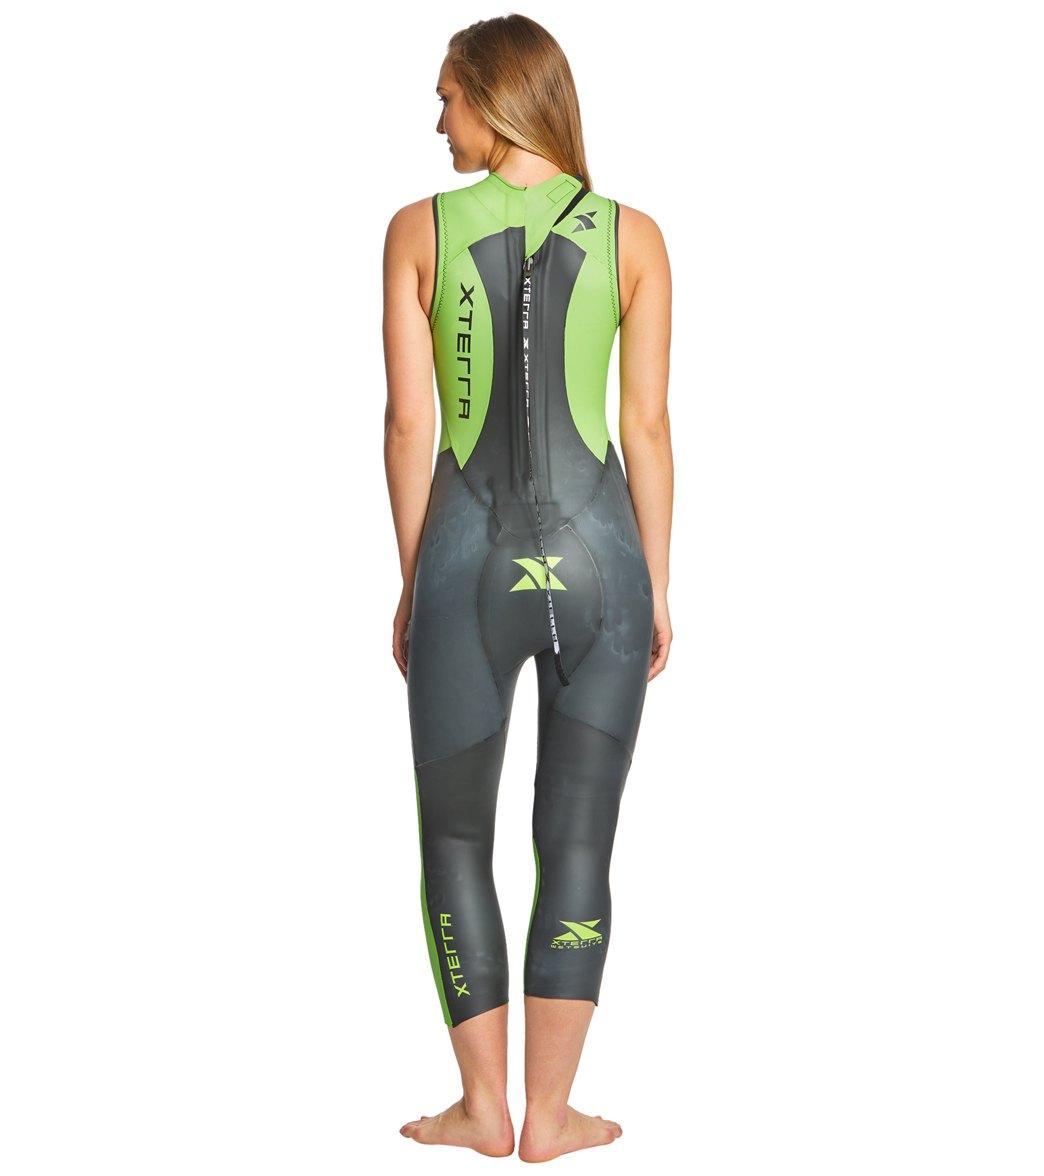 5b3947bb81 Xterra Wetsuits Women s Vivid Sleeveless Wetsuit at SwimOutlet.com ...